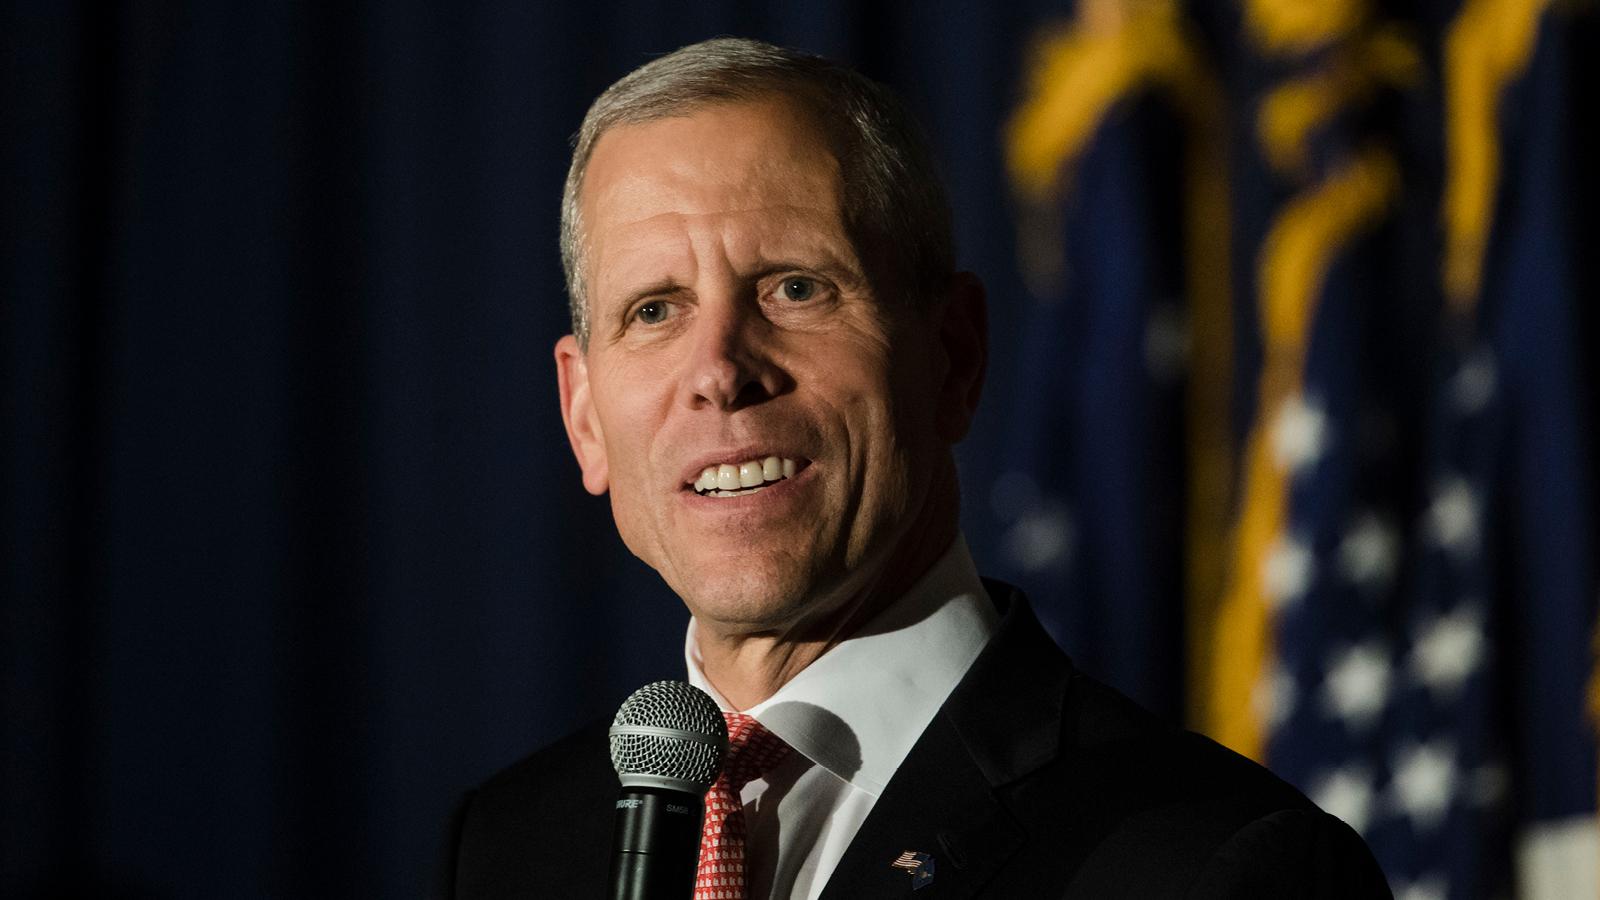 HRC Opposes Pennsylvania's Anti-Transgender Candidate Paul Mango